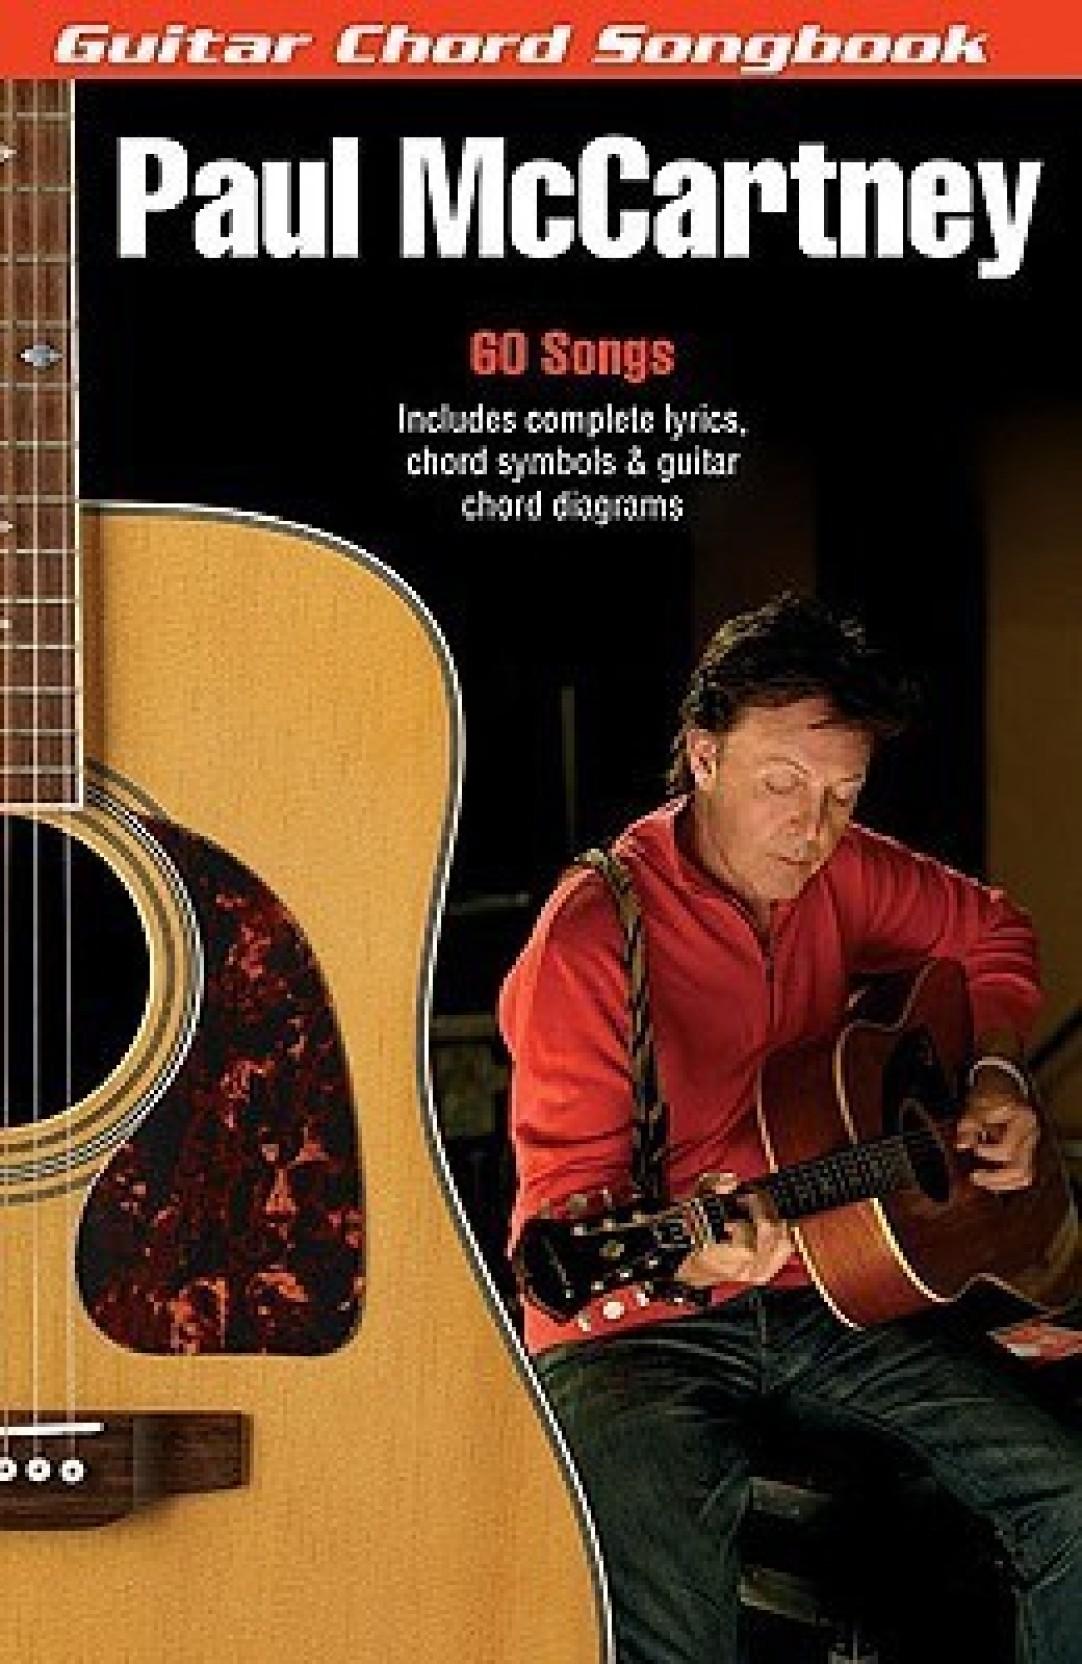 Paul Mccartney Guitar Chord Songbook 6 Inch X 9 Inch Guitar